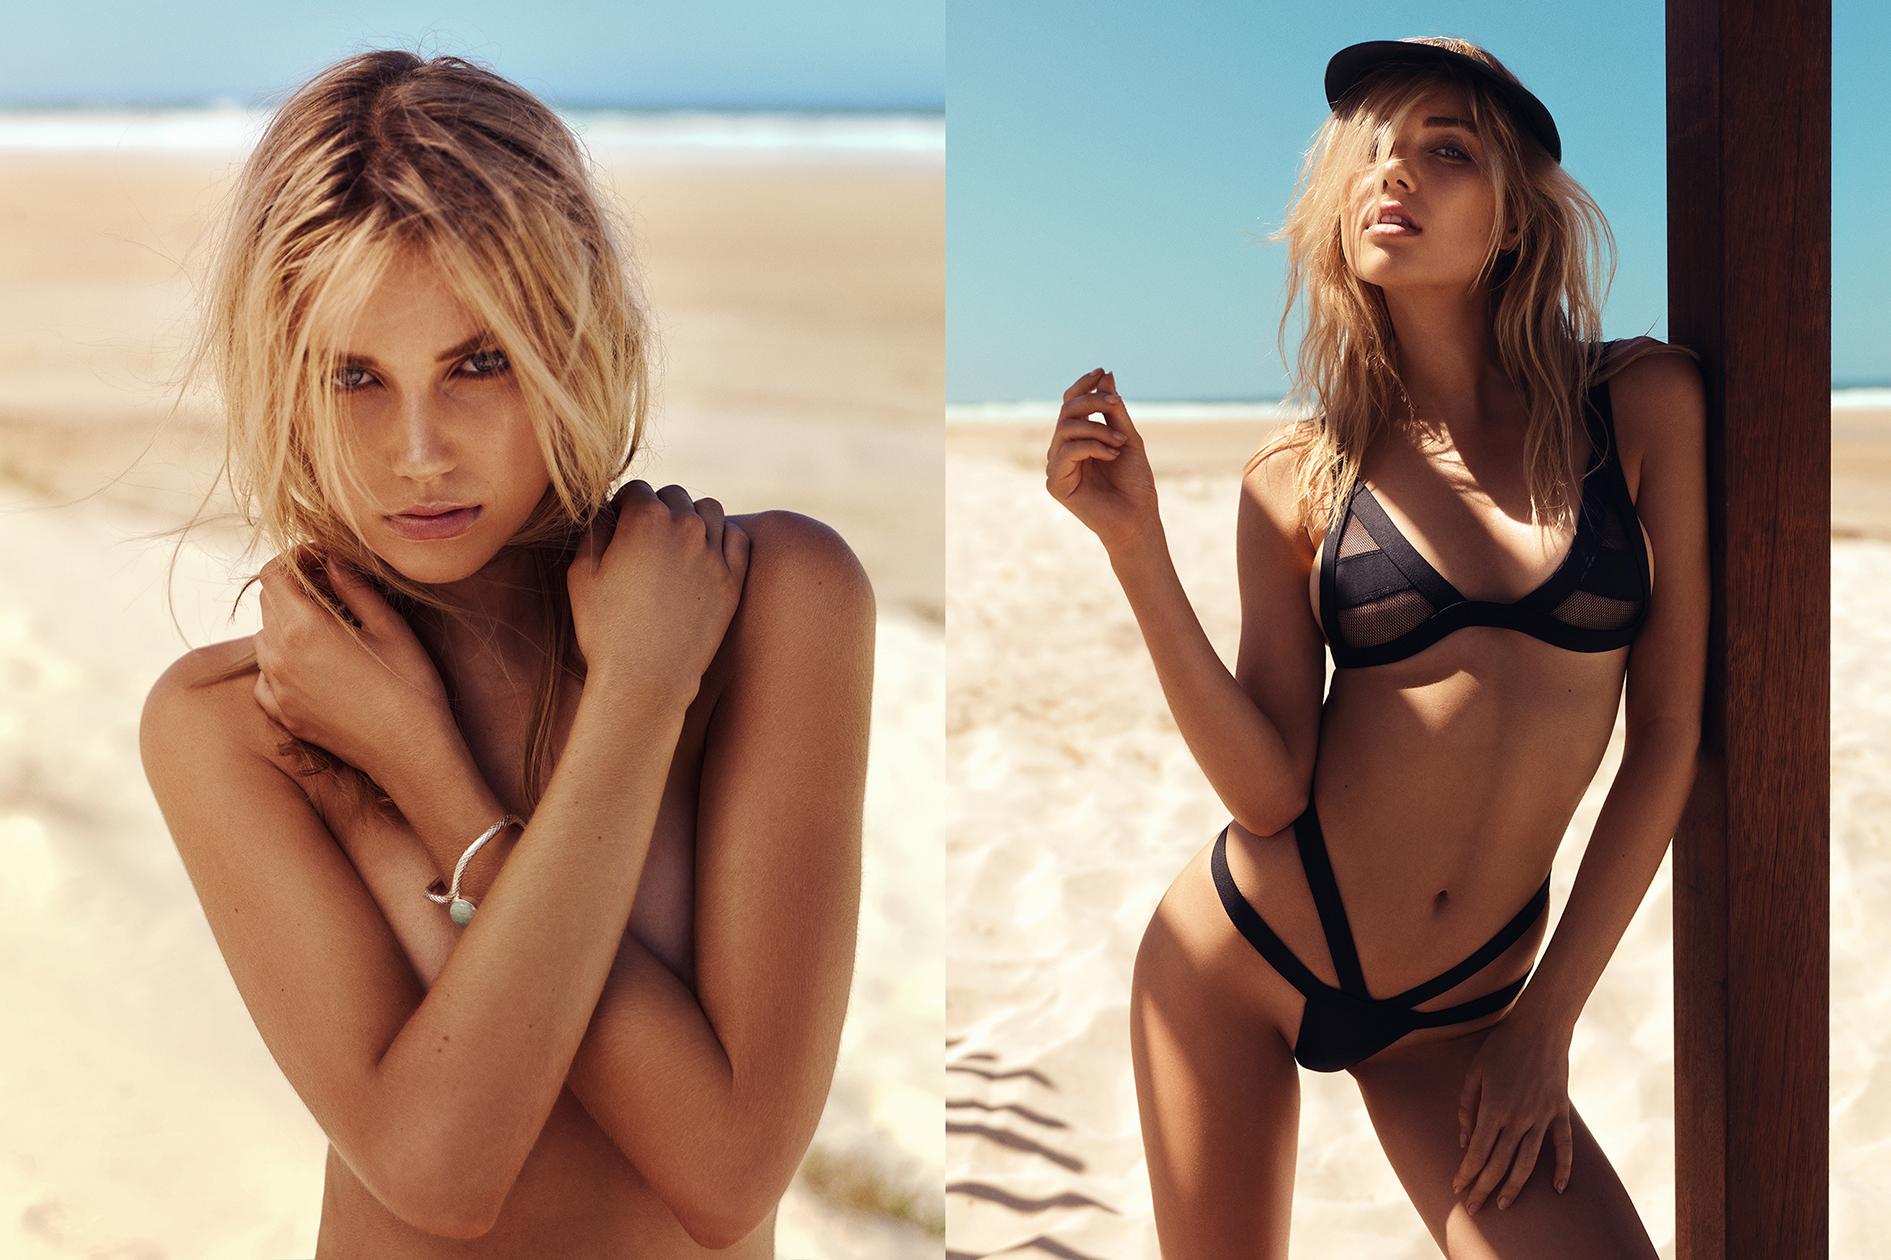 Georgia-Martin-Viviens-Models-Sydney-Beah-Byron-Bay-Photographer-Mark-SullivanBradley.jpg